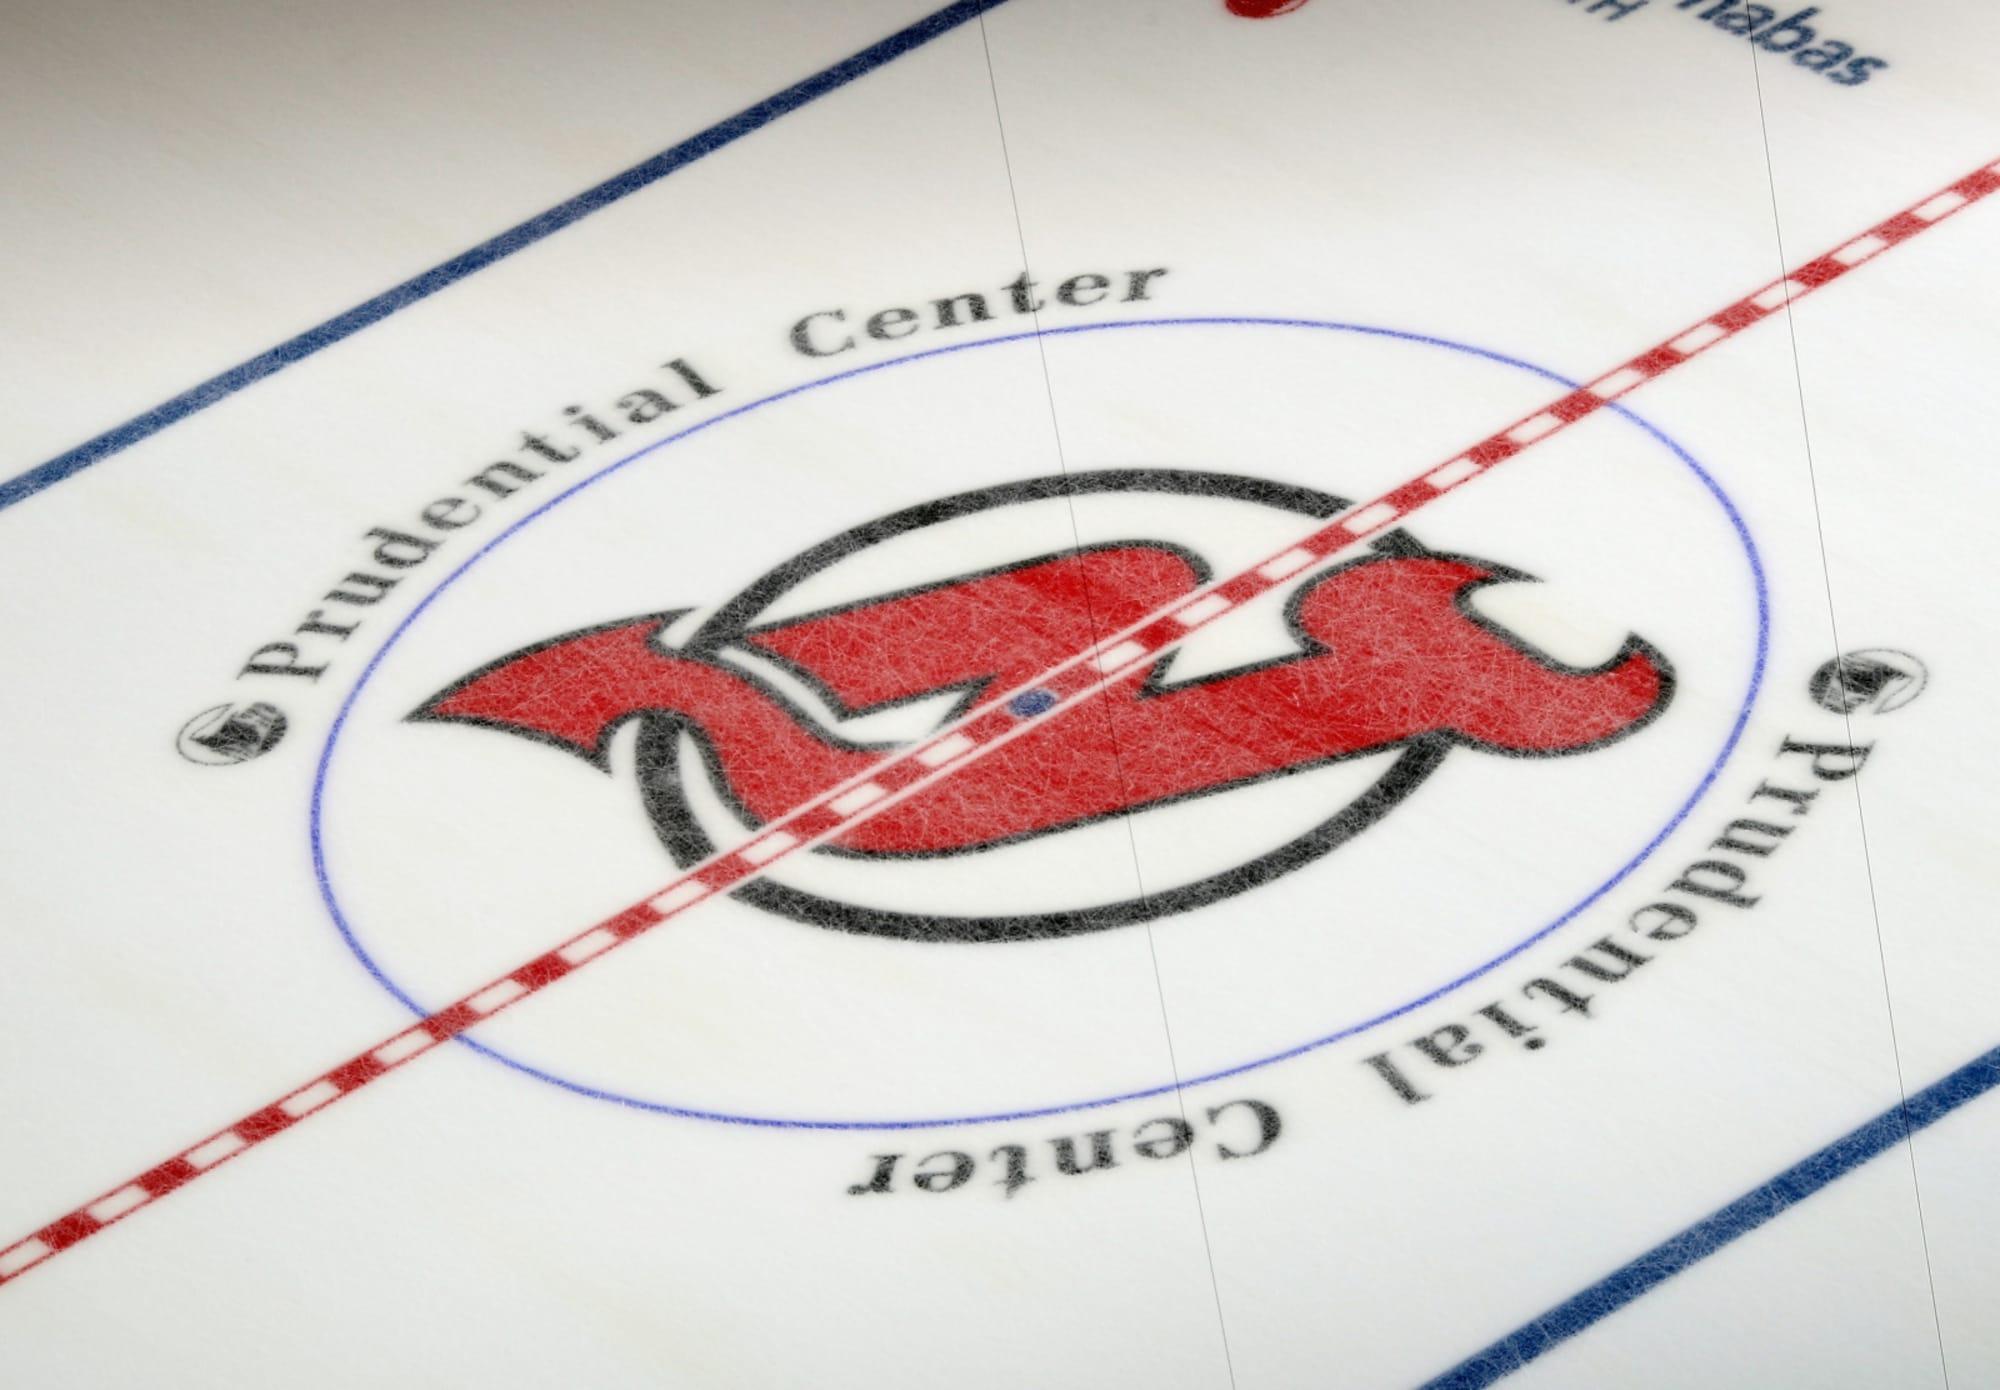 New Jersey Devils: Grading Artem Shlaine Pick In 2020 NHL Draft